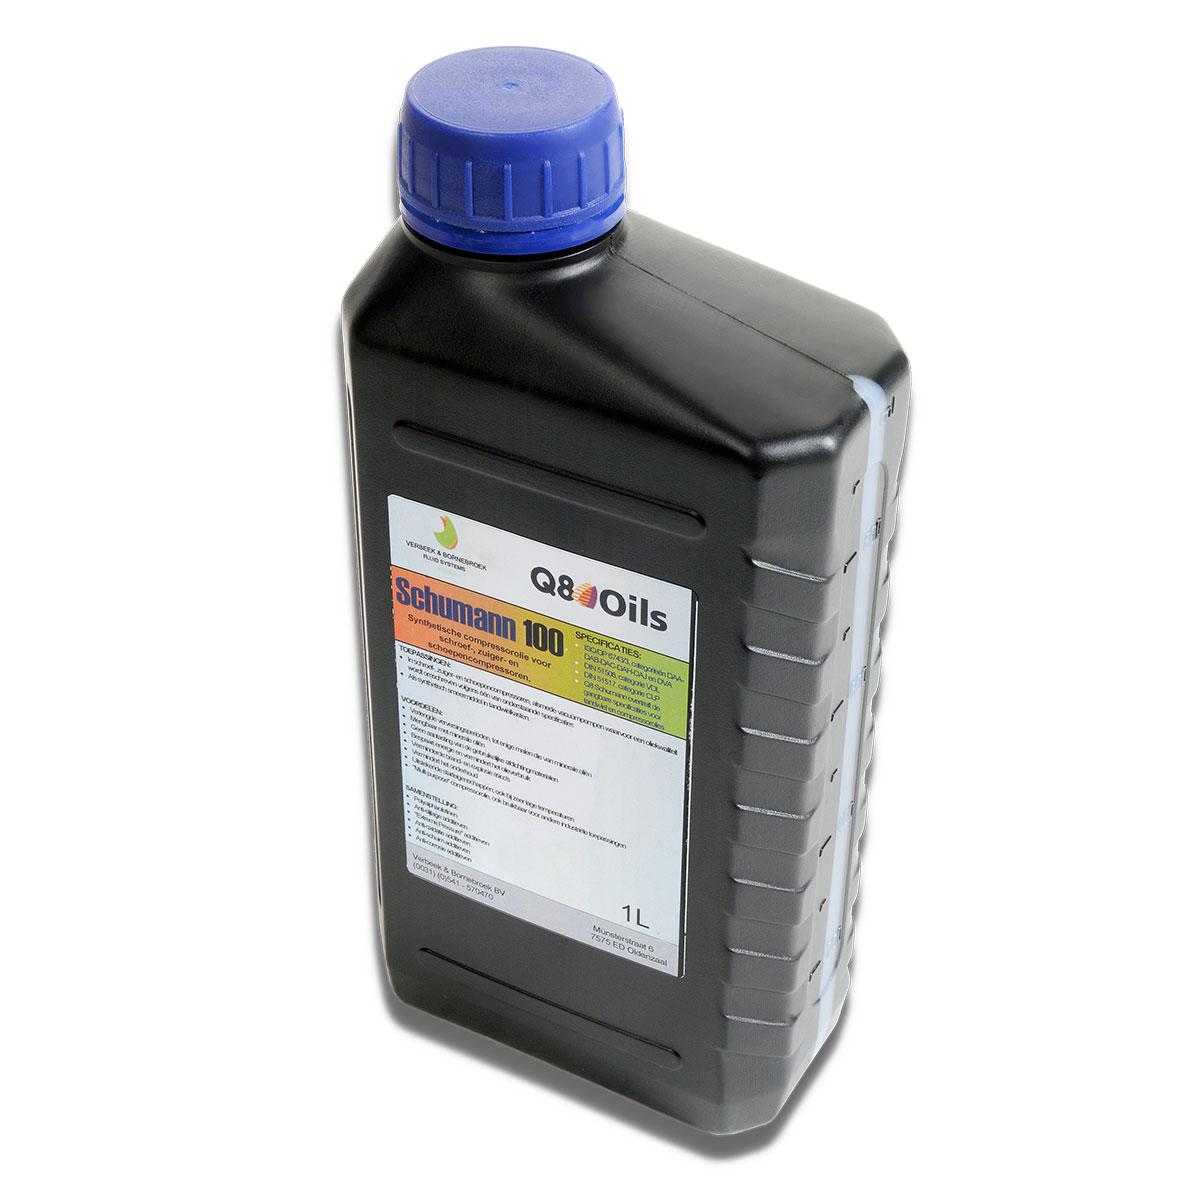 olie 1 liter voor vacuumpomp hbtb